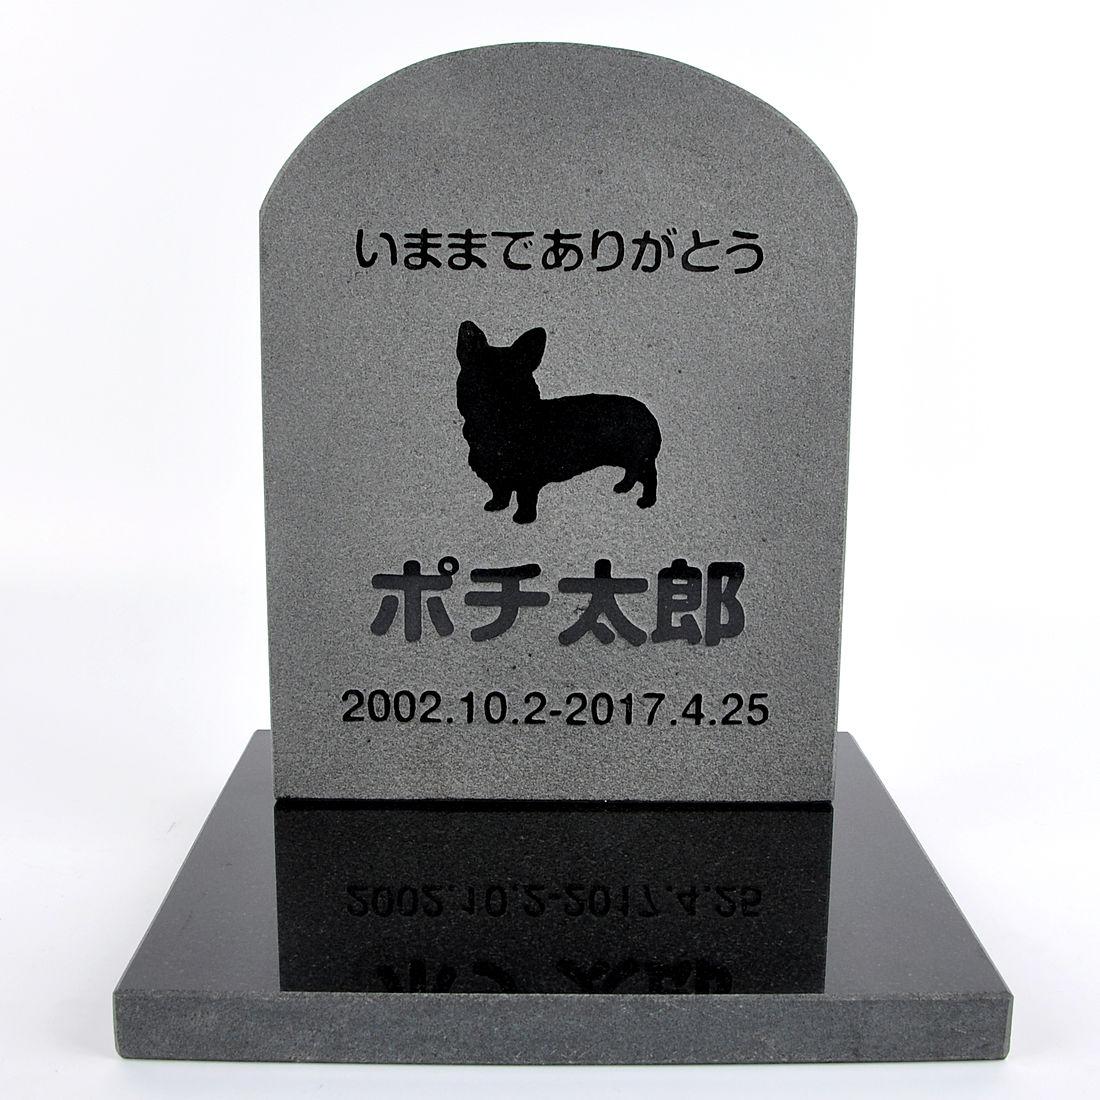 Pet&Love. ペットのお墓 天然石製 セット型 御影石 ブラック 浮き彫り スタンダード  【HLS_DU】【楽ギフ_名入れ】 attr131attr ctgr2ctgr sml3sml+ctgr2ctgr DOG